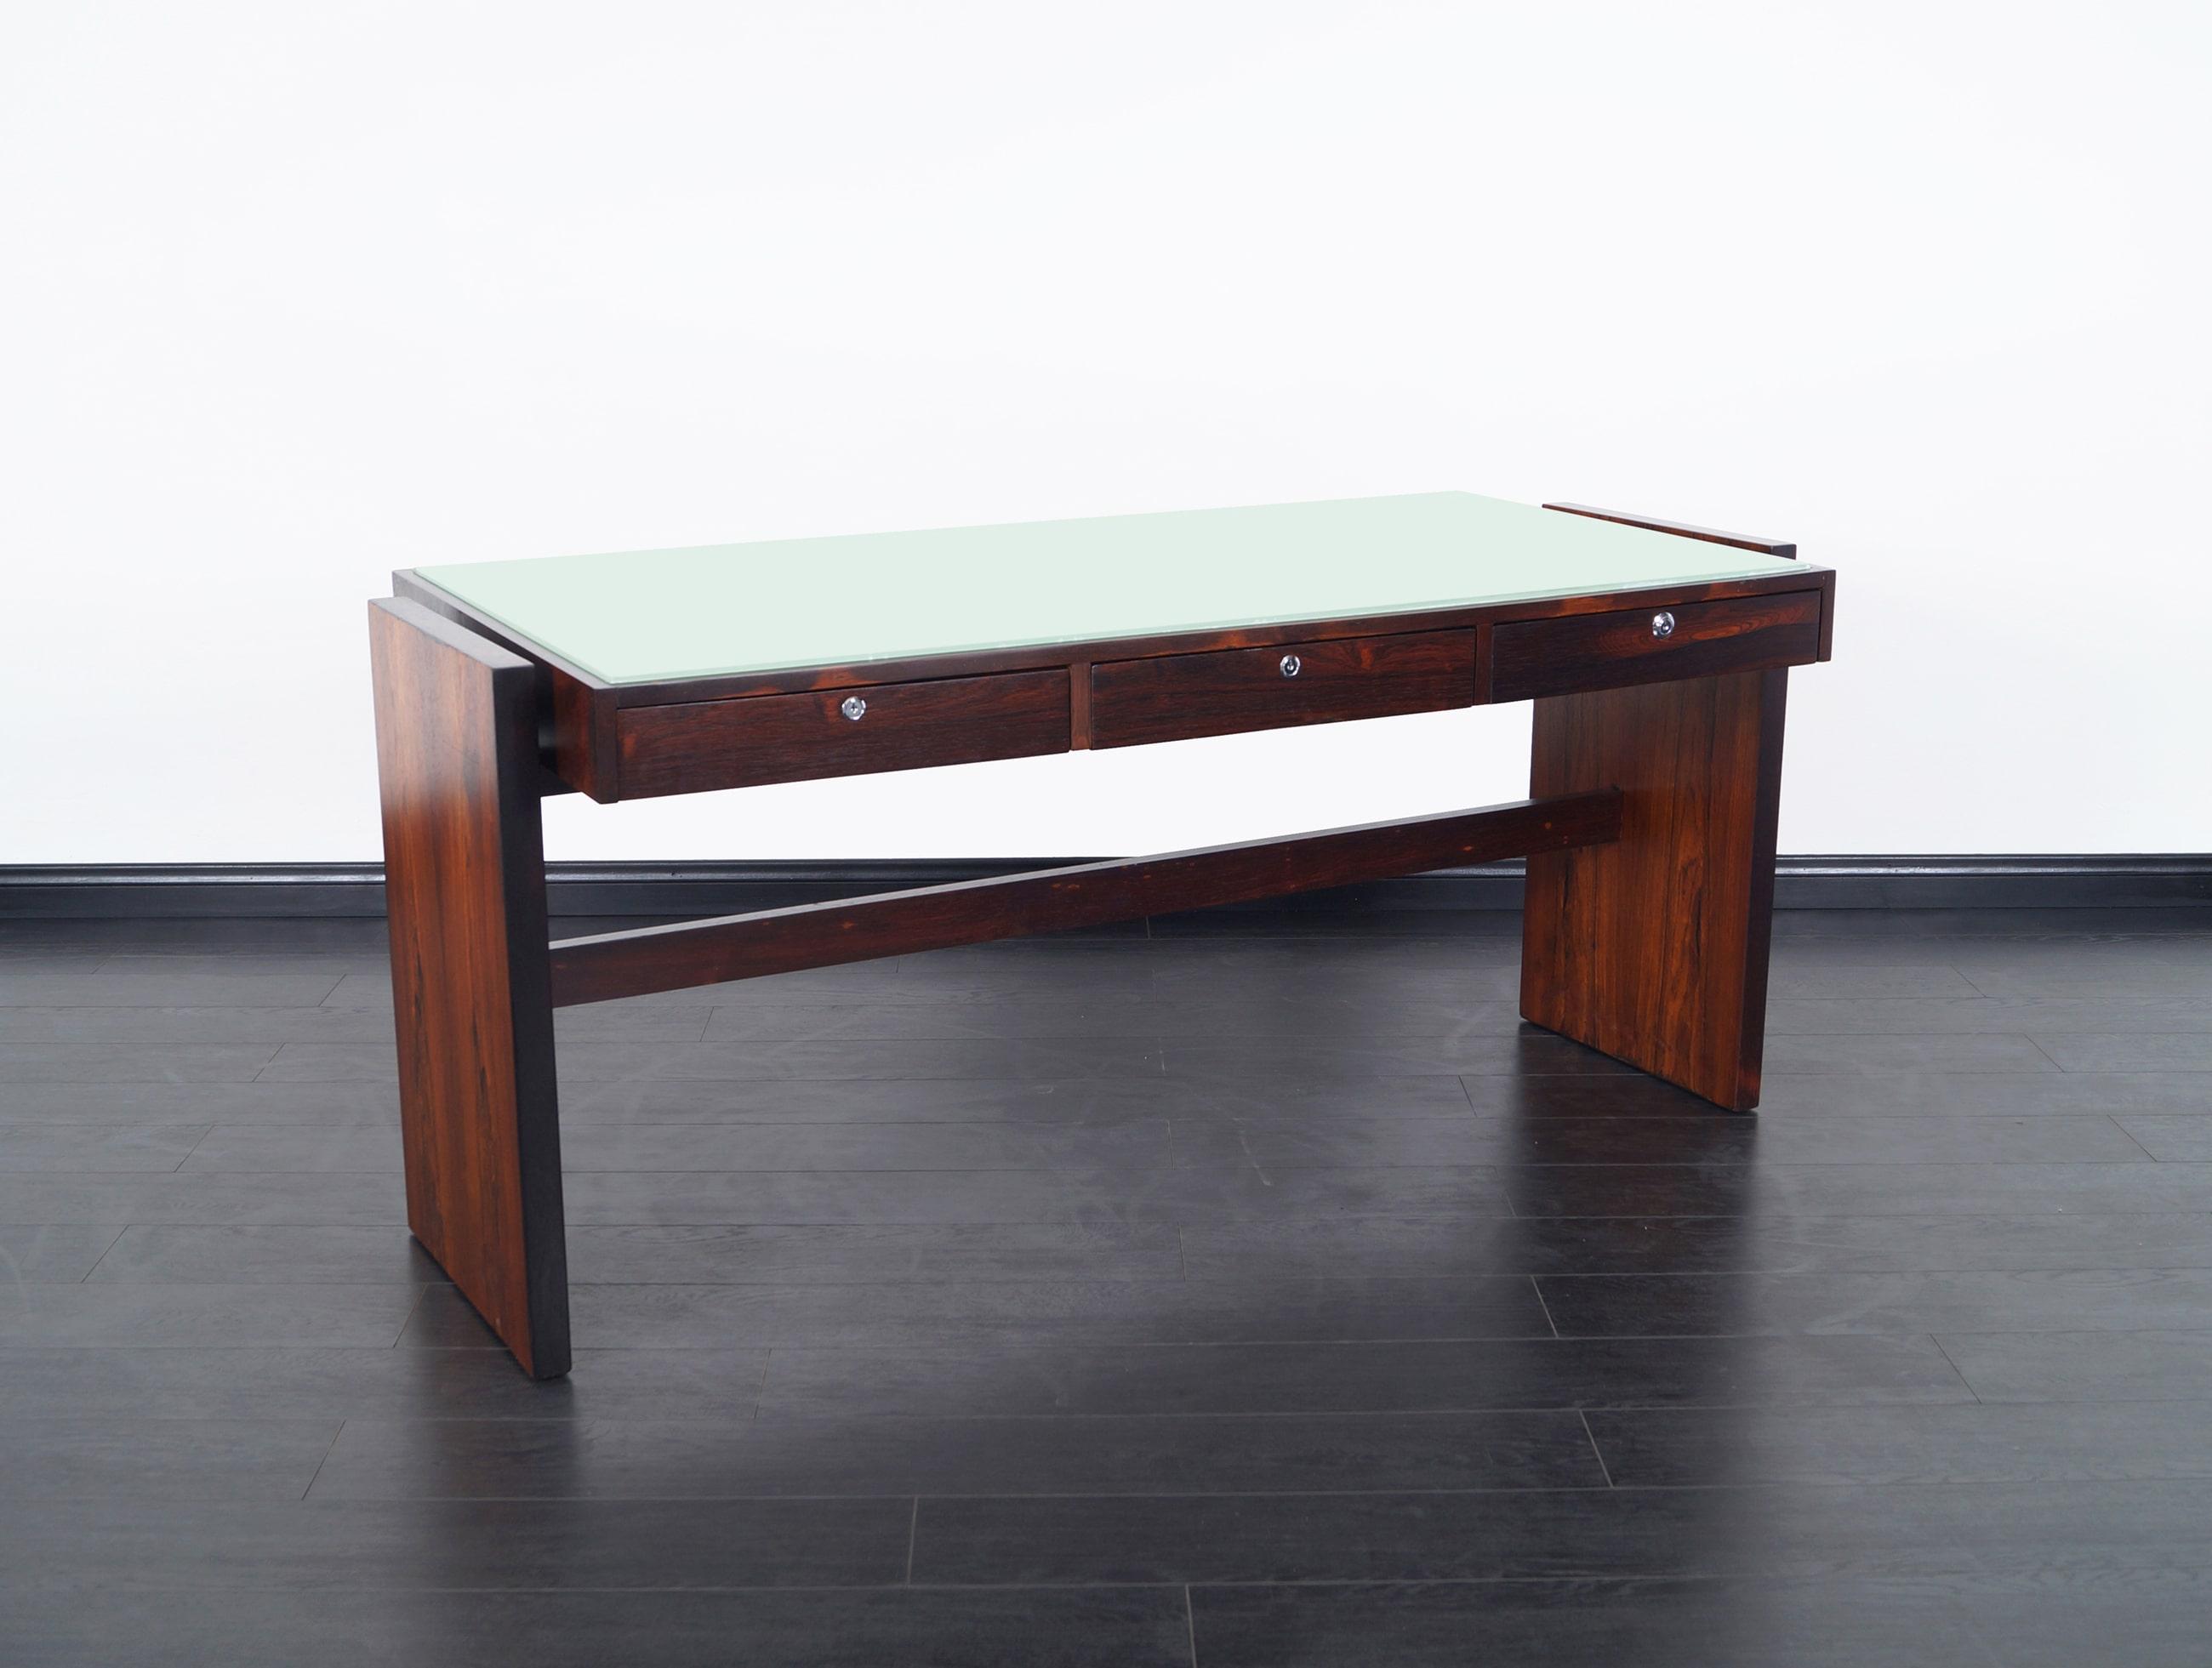 Brazilian Rosewood Desk by Joaquim Tenreiro